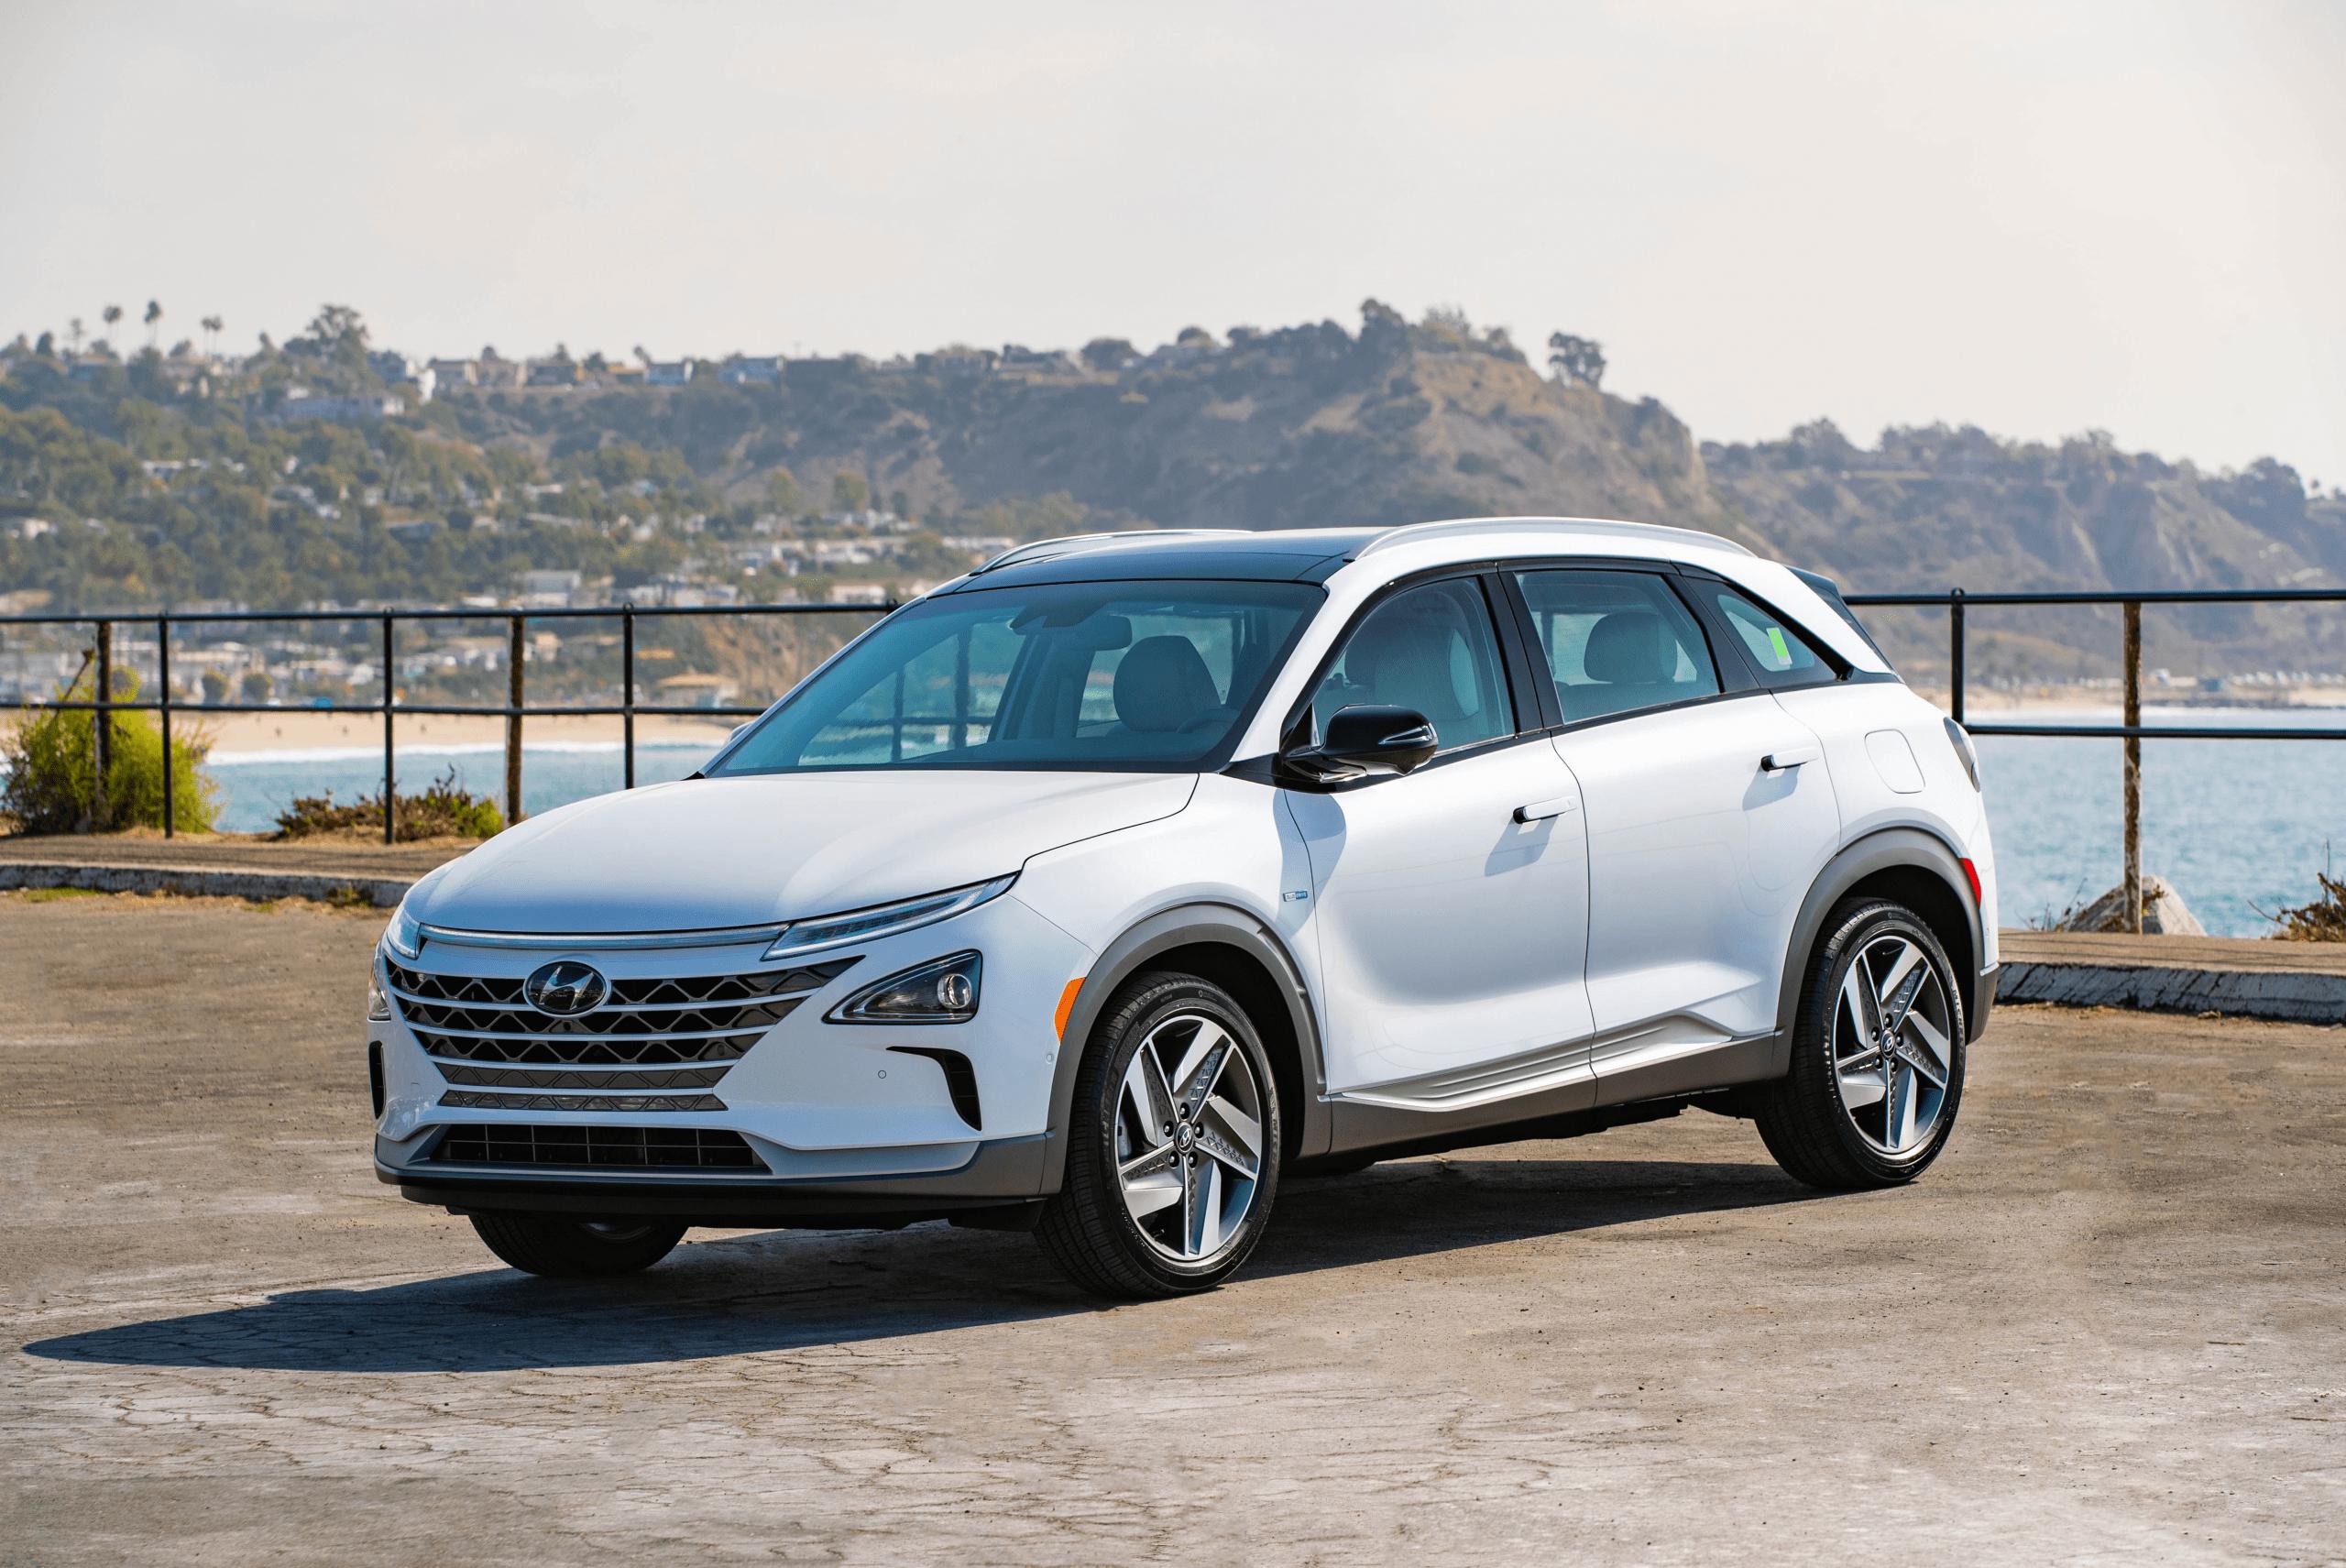 2020 Hyundai I20 Specs and Review in 2020 Hyundai